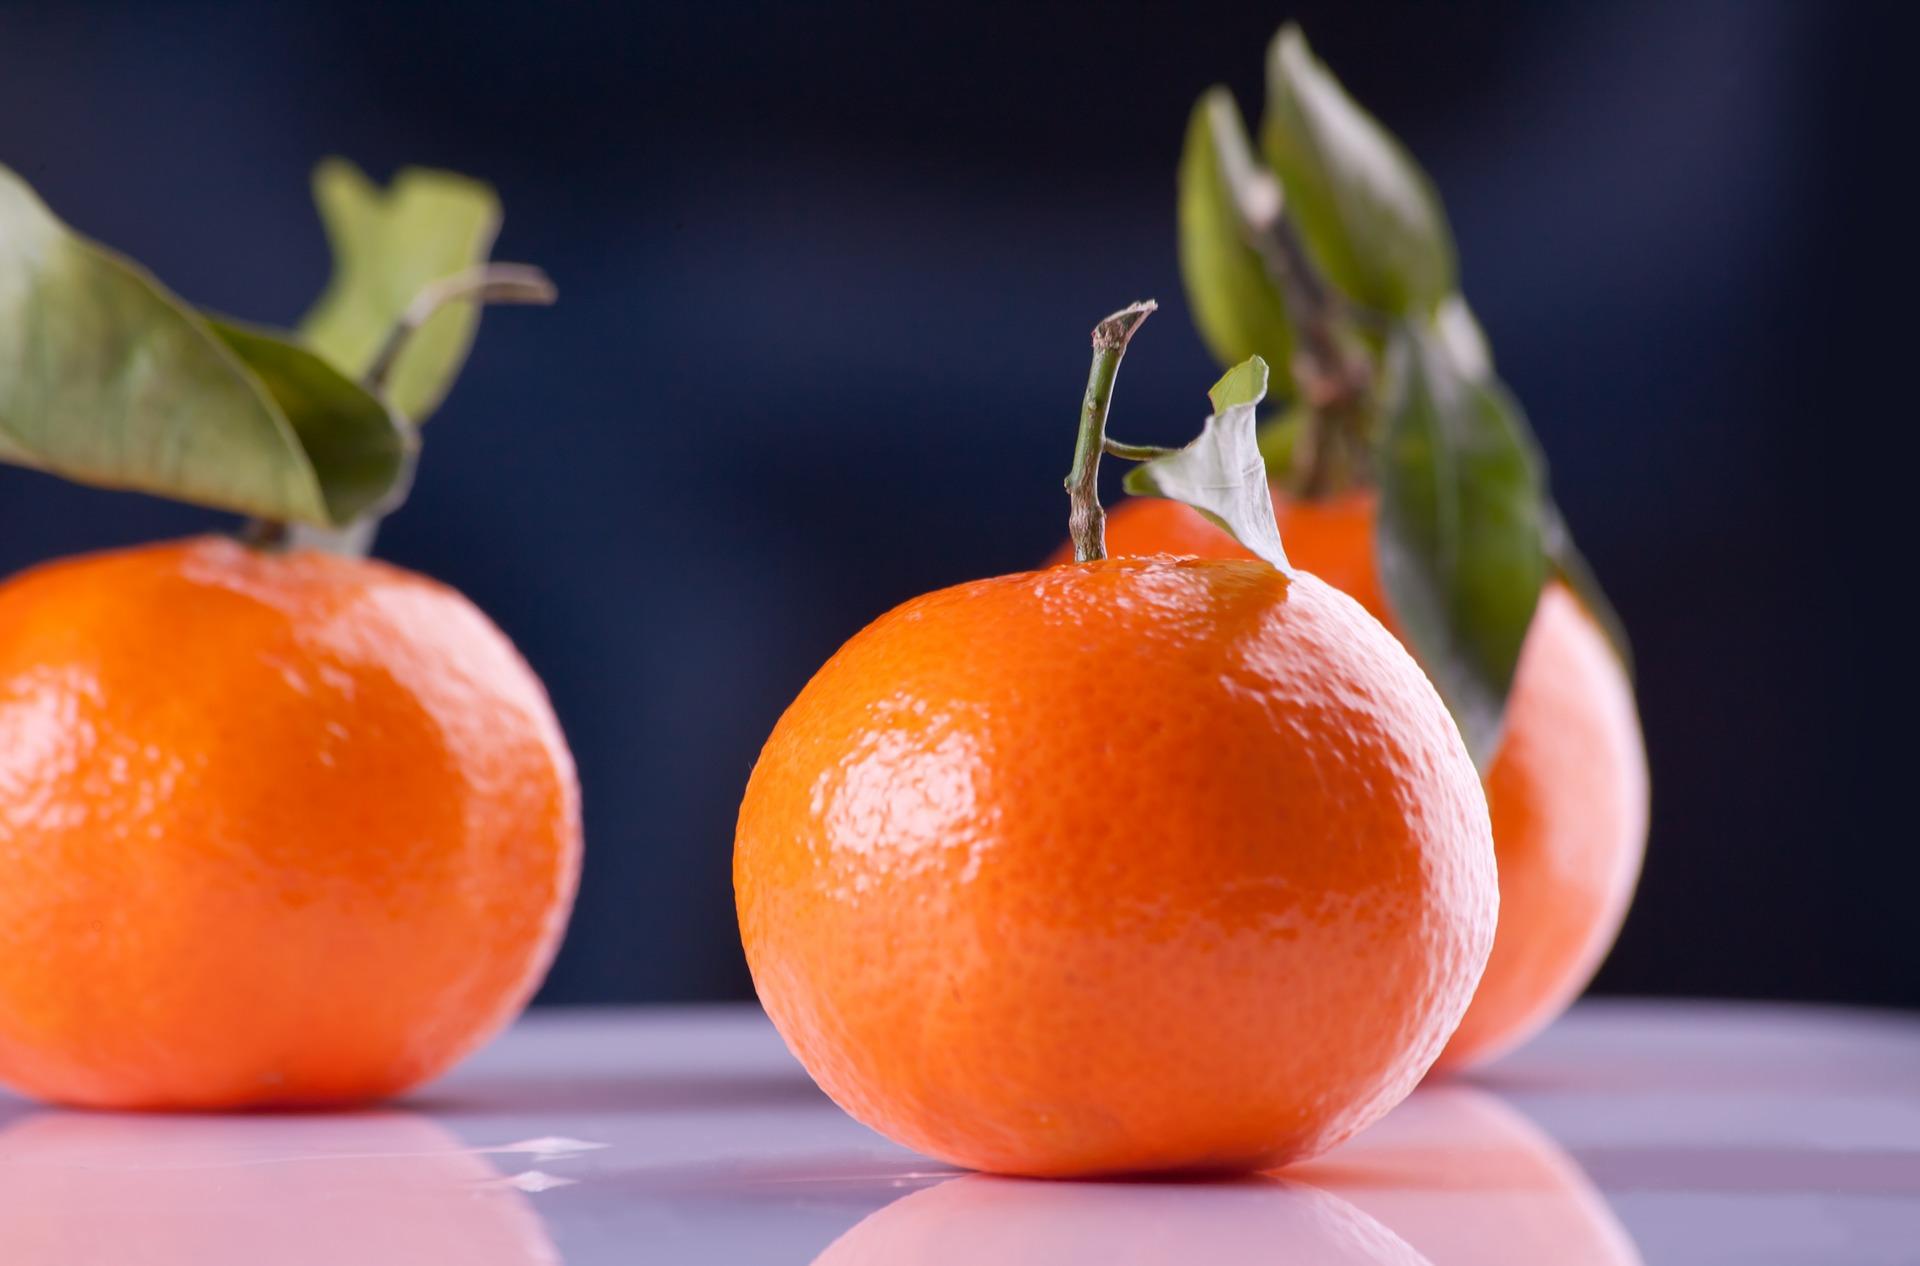 tangerines-599578_1920.jpg